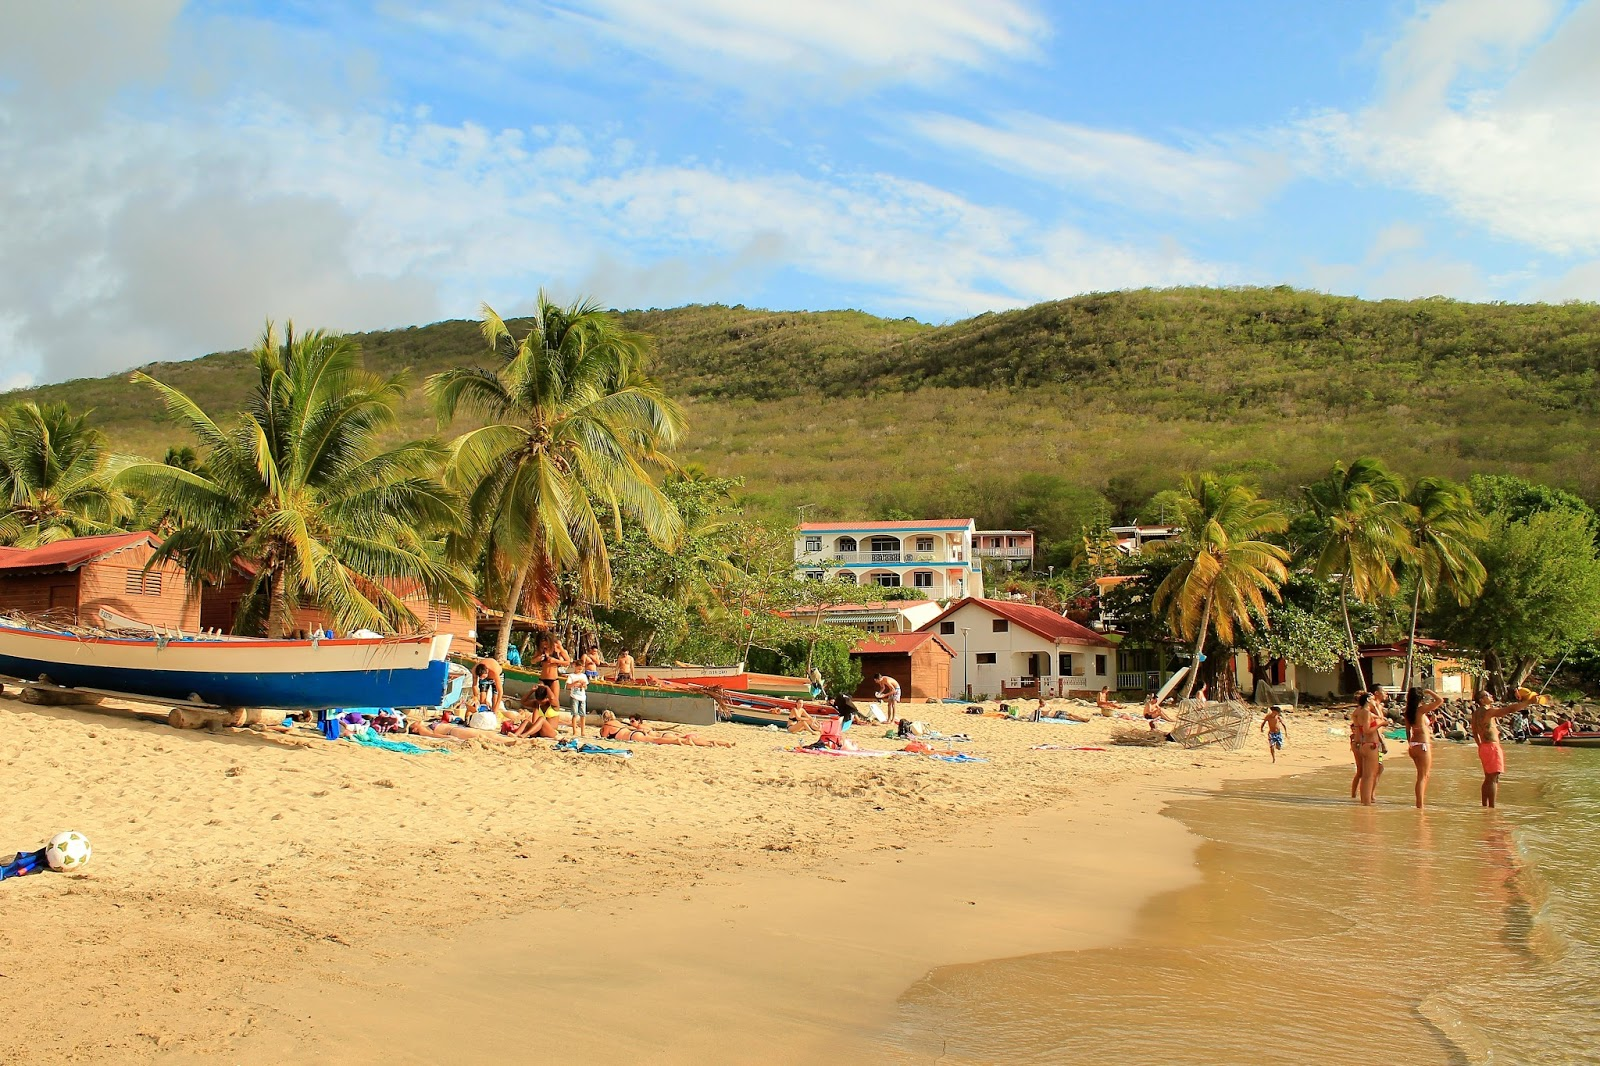 martinique caraibes vacances île dom tom visite anse dufour plage tortue paradisiaque